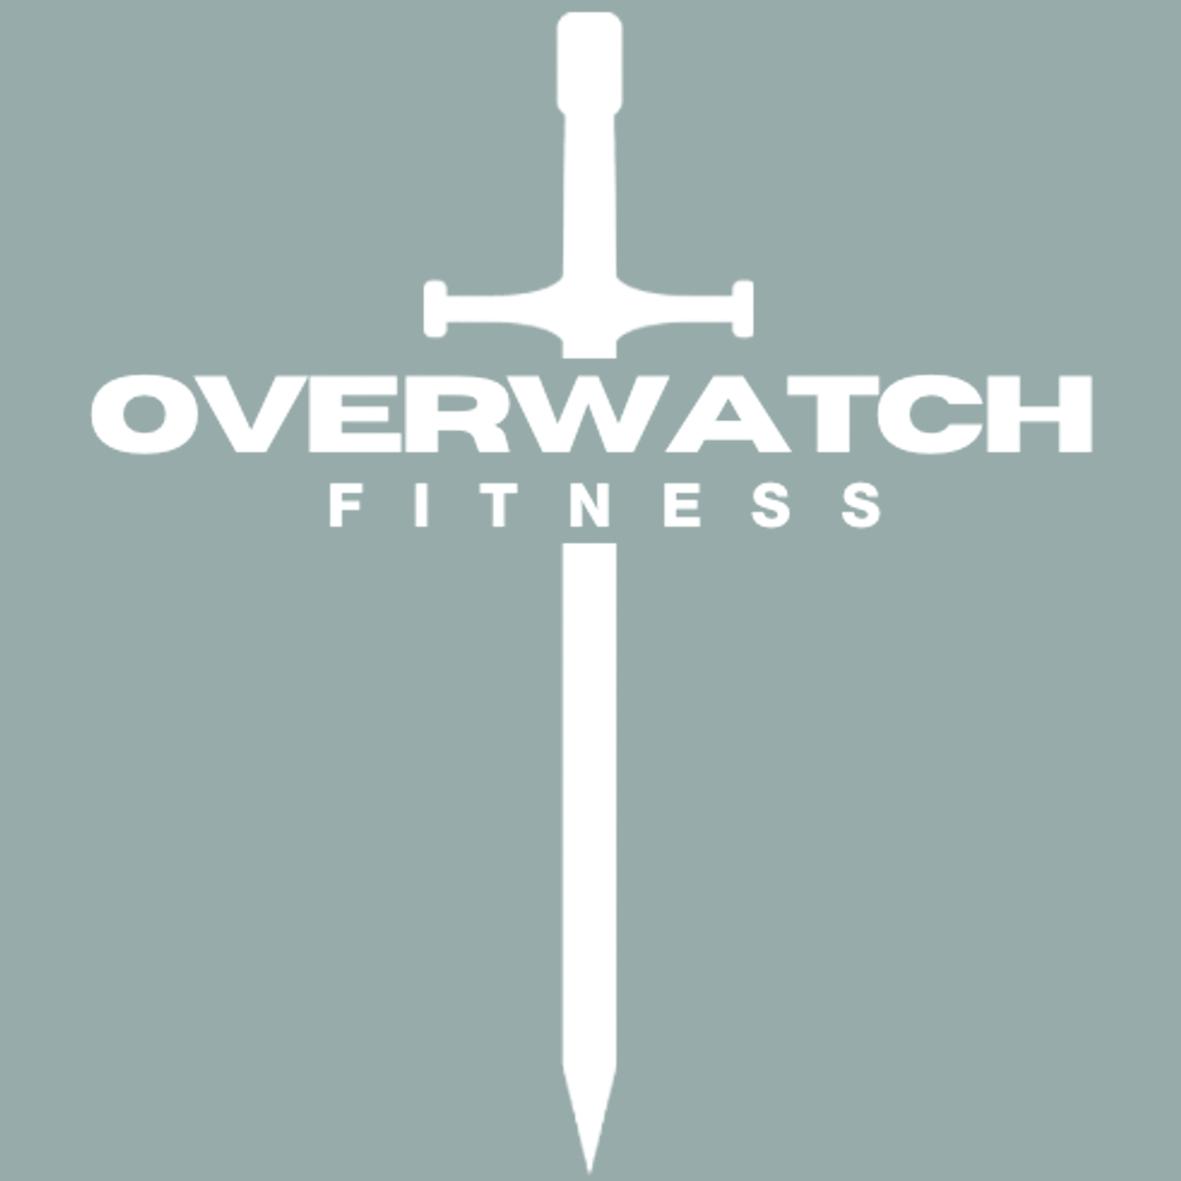 Overwatch Fitness